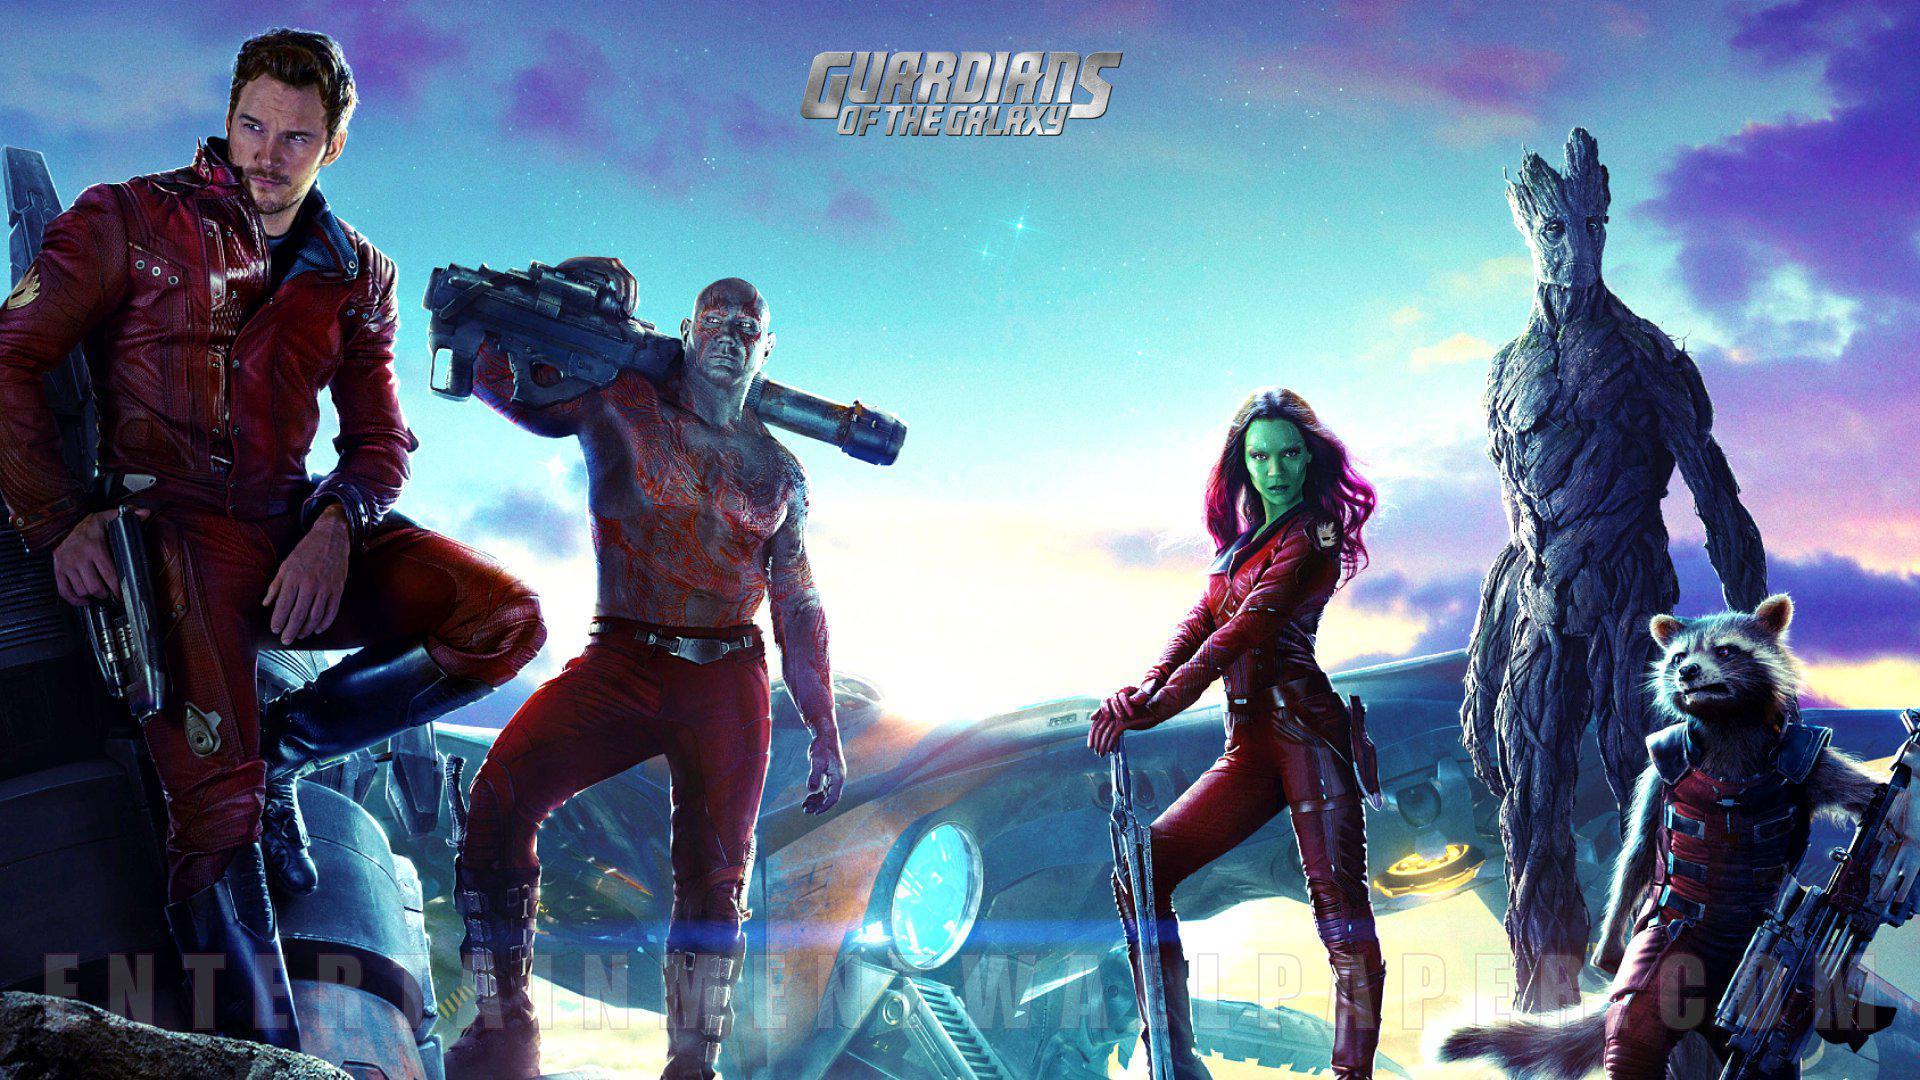 z-guardians-of-the-galaxy-movie-review-fe558d3c-f218-44b6-9331-bcaa8d853e80.jpeg